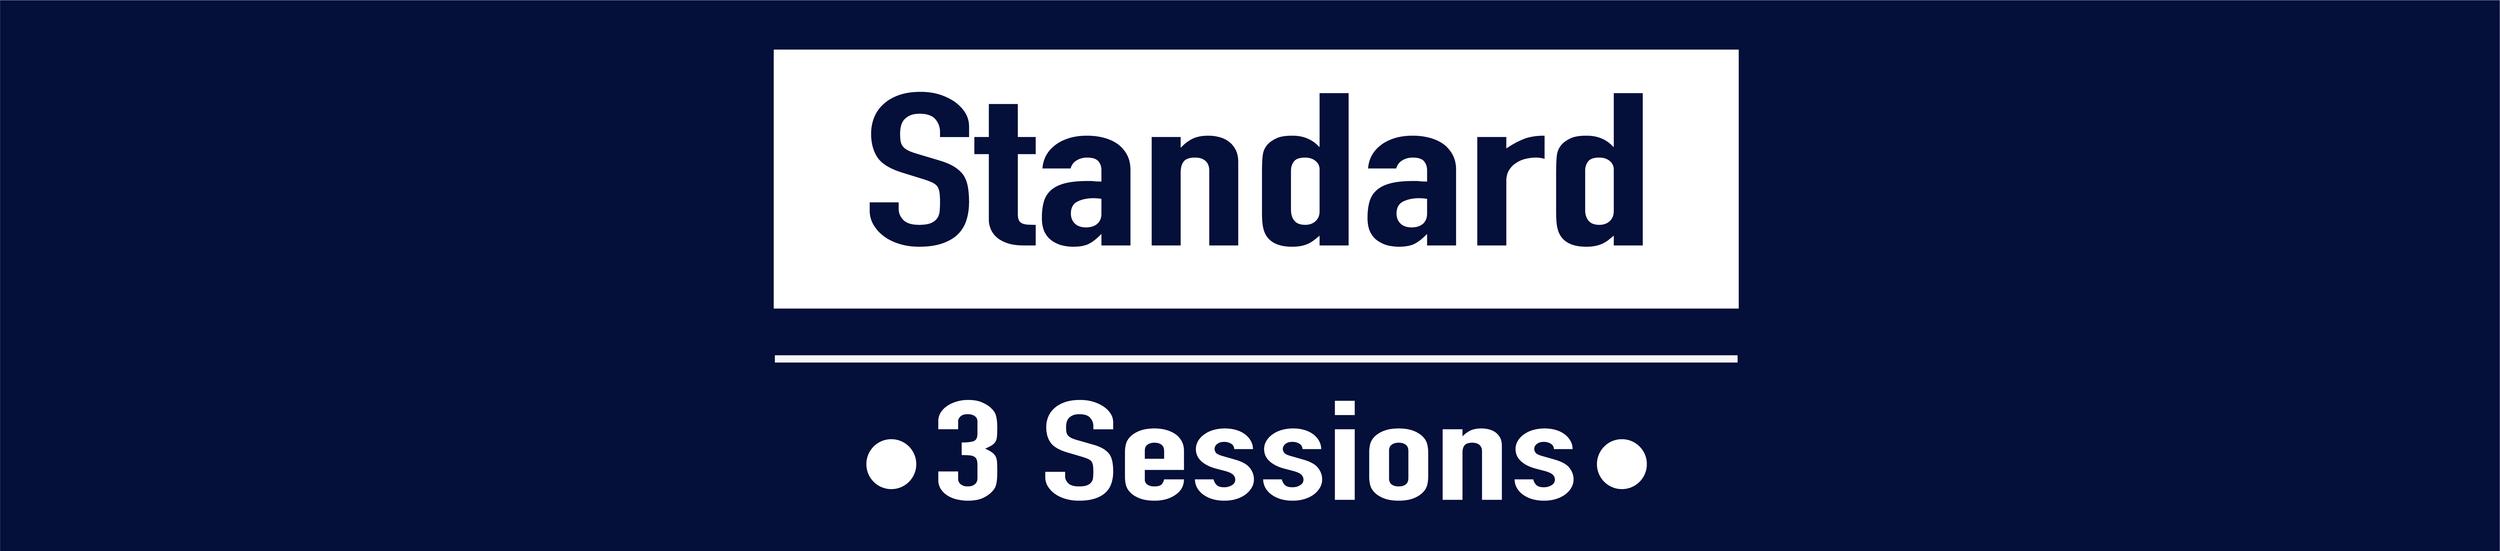 Standardheader-02.png